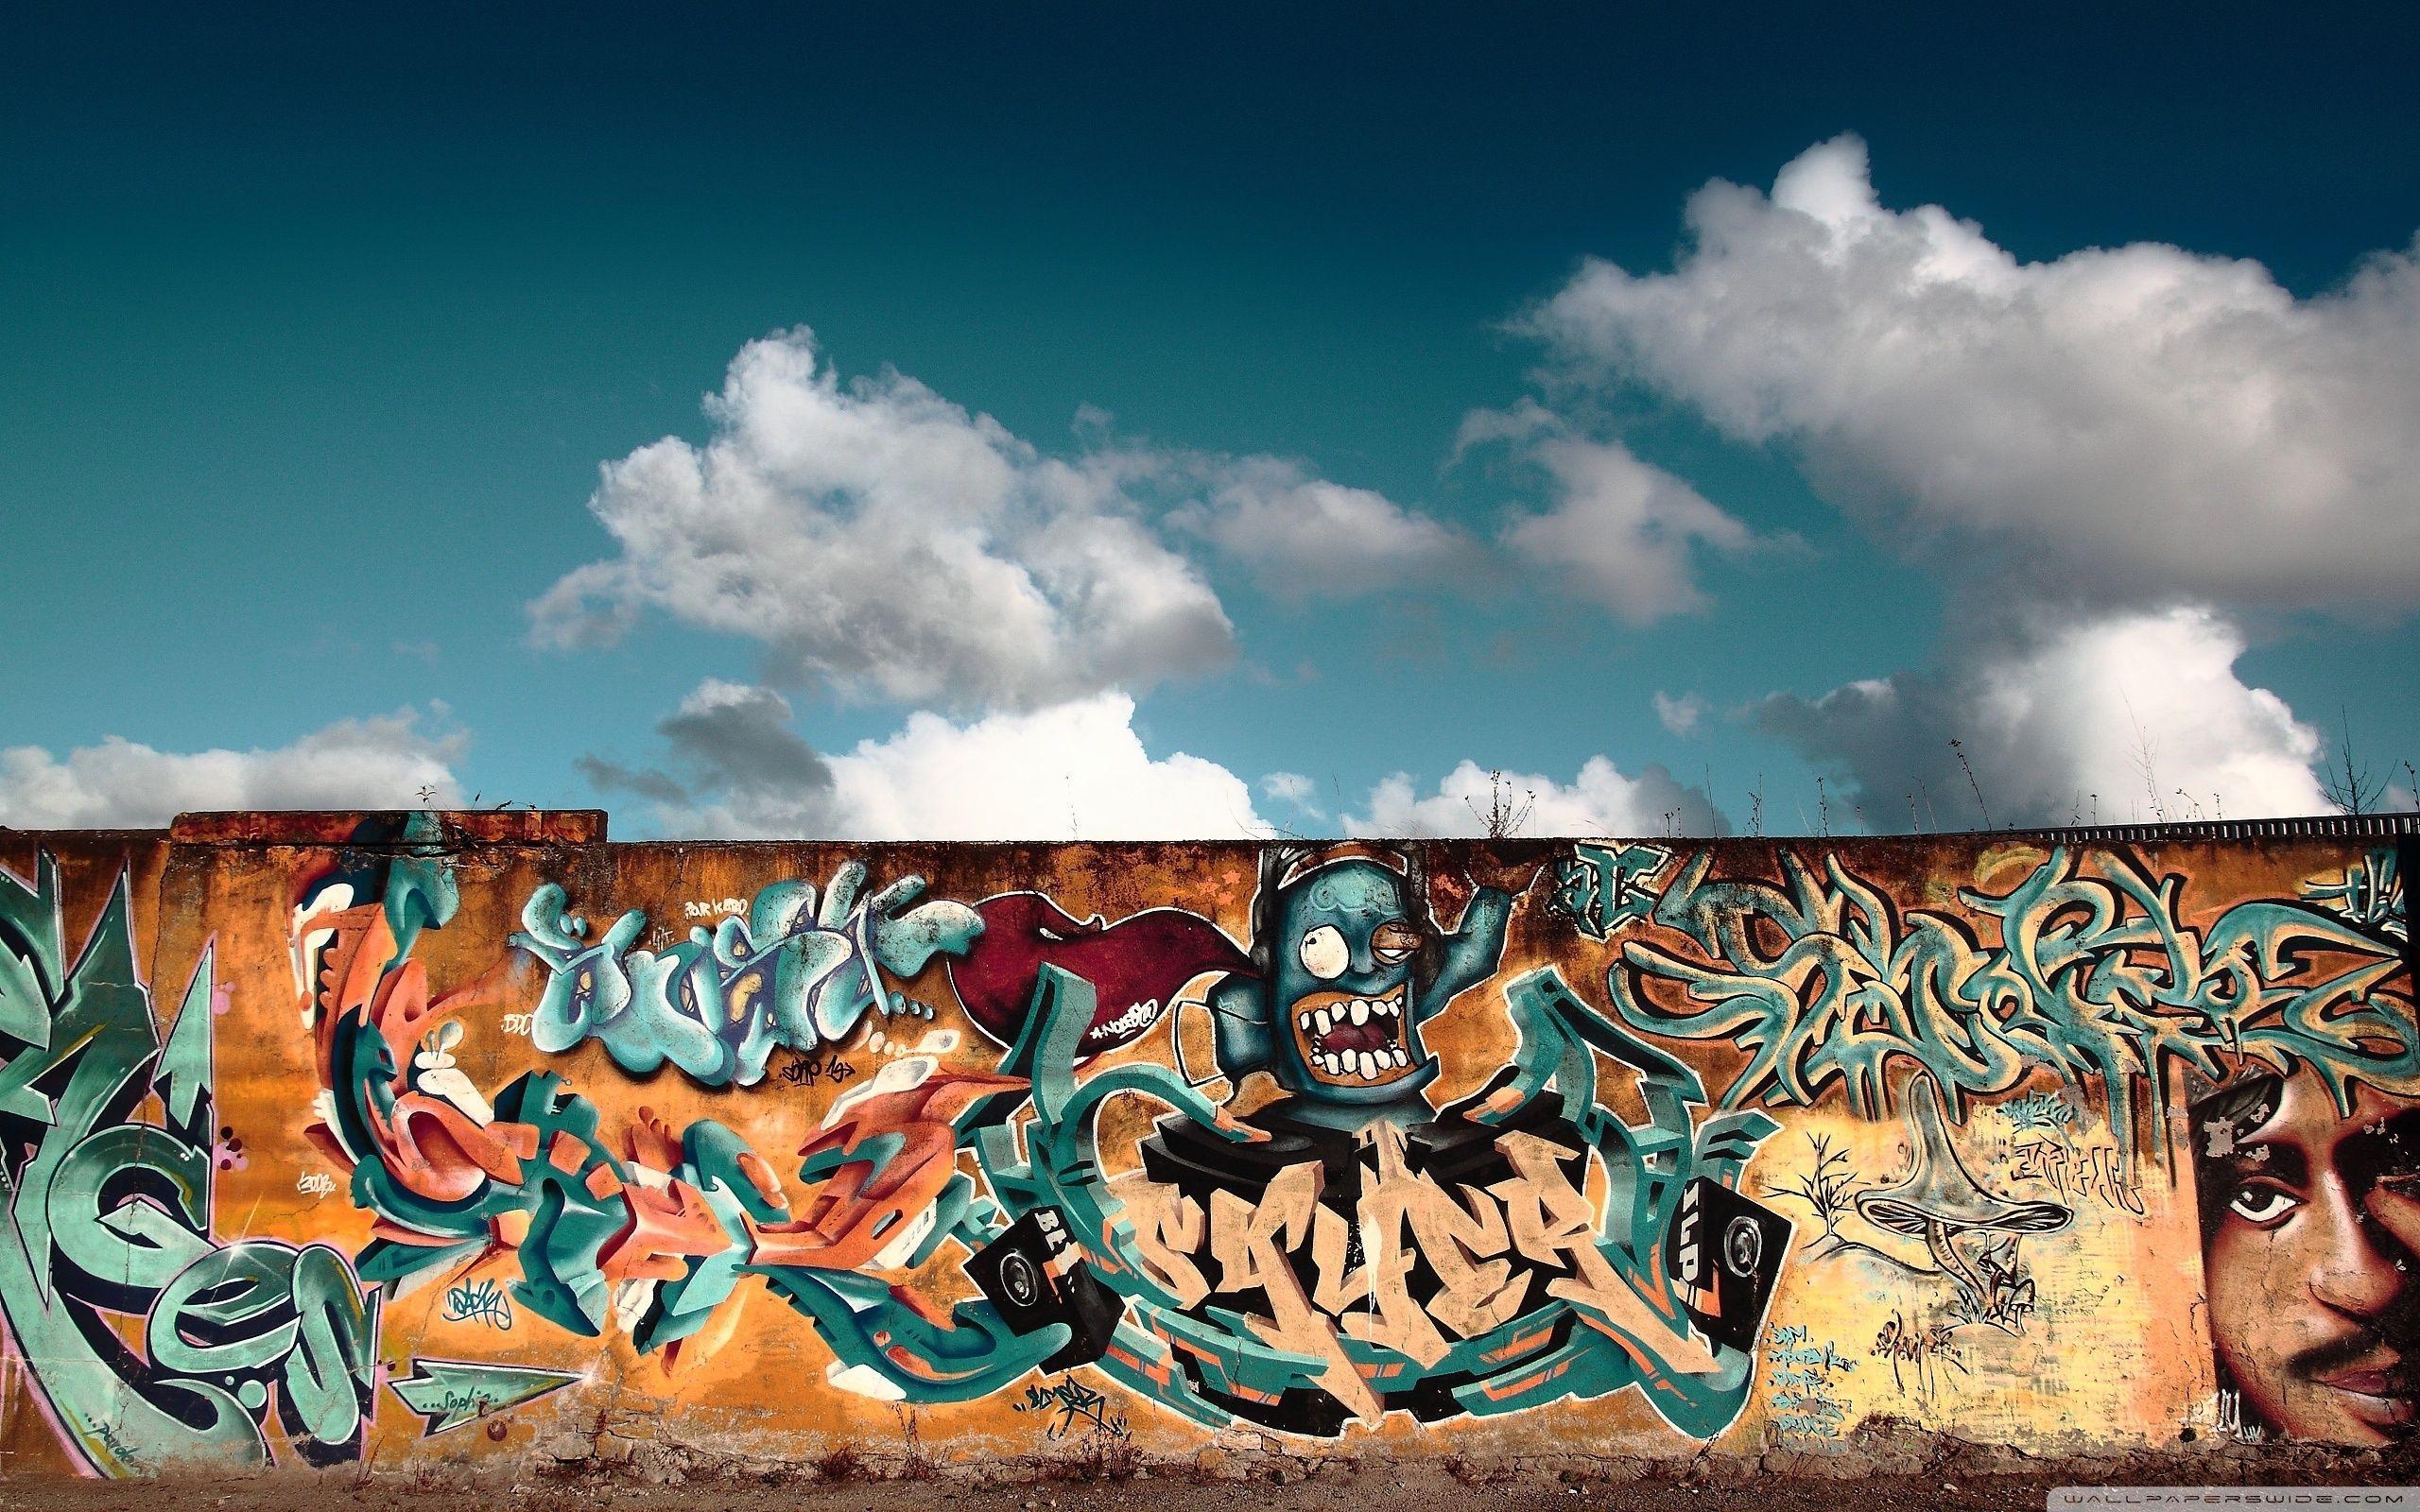 Wall Art Wallpapers Top Free Wall Art Backgrounds Wallpaperaccess